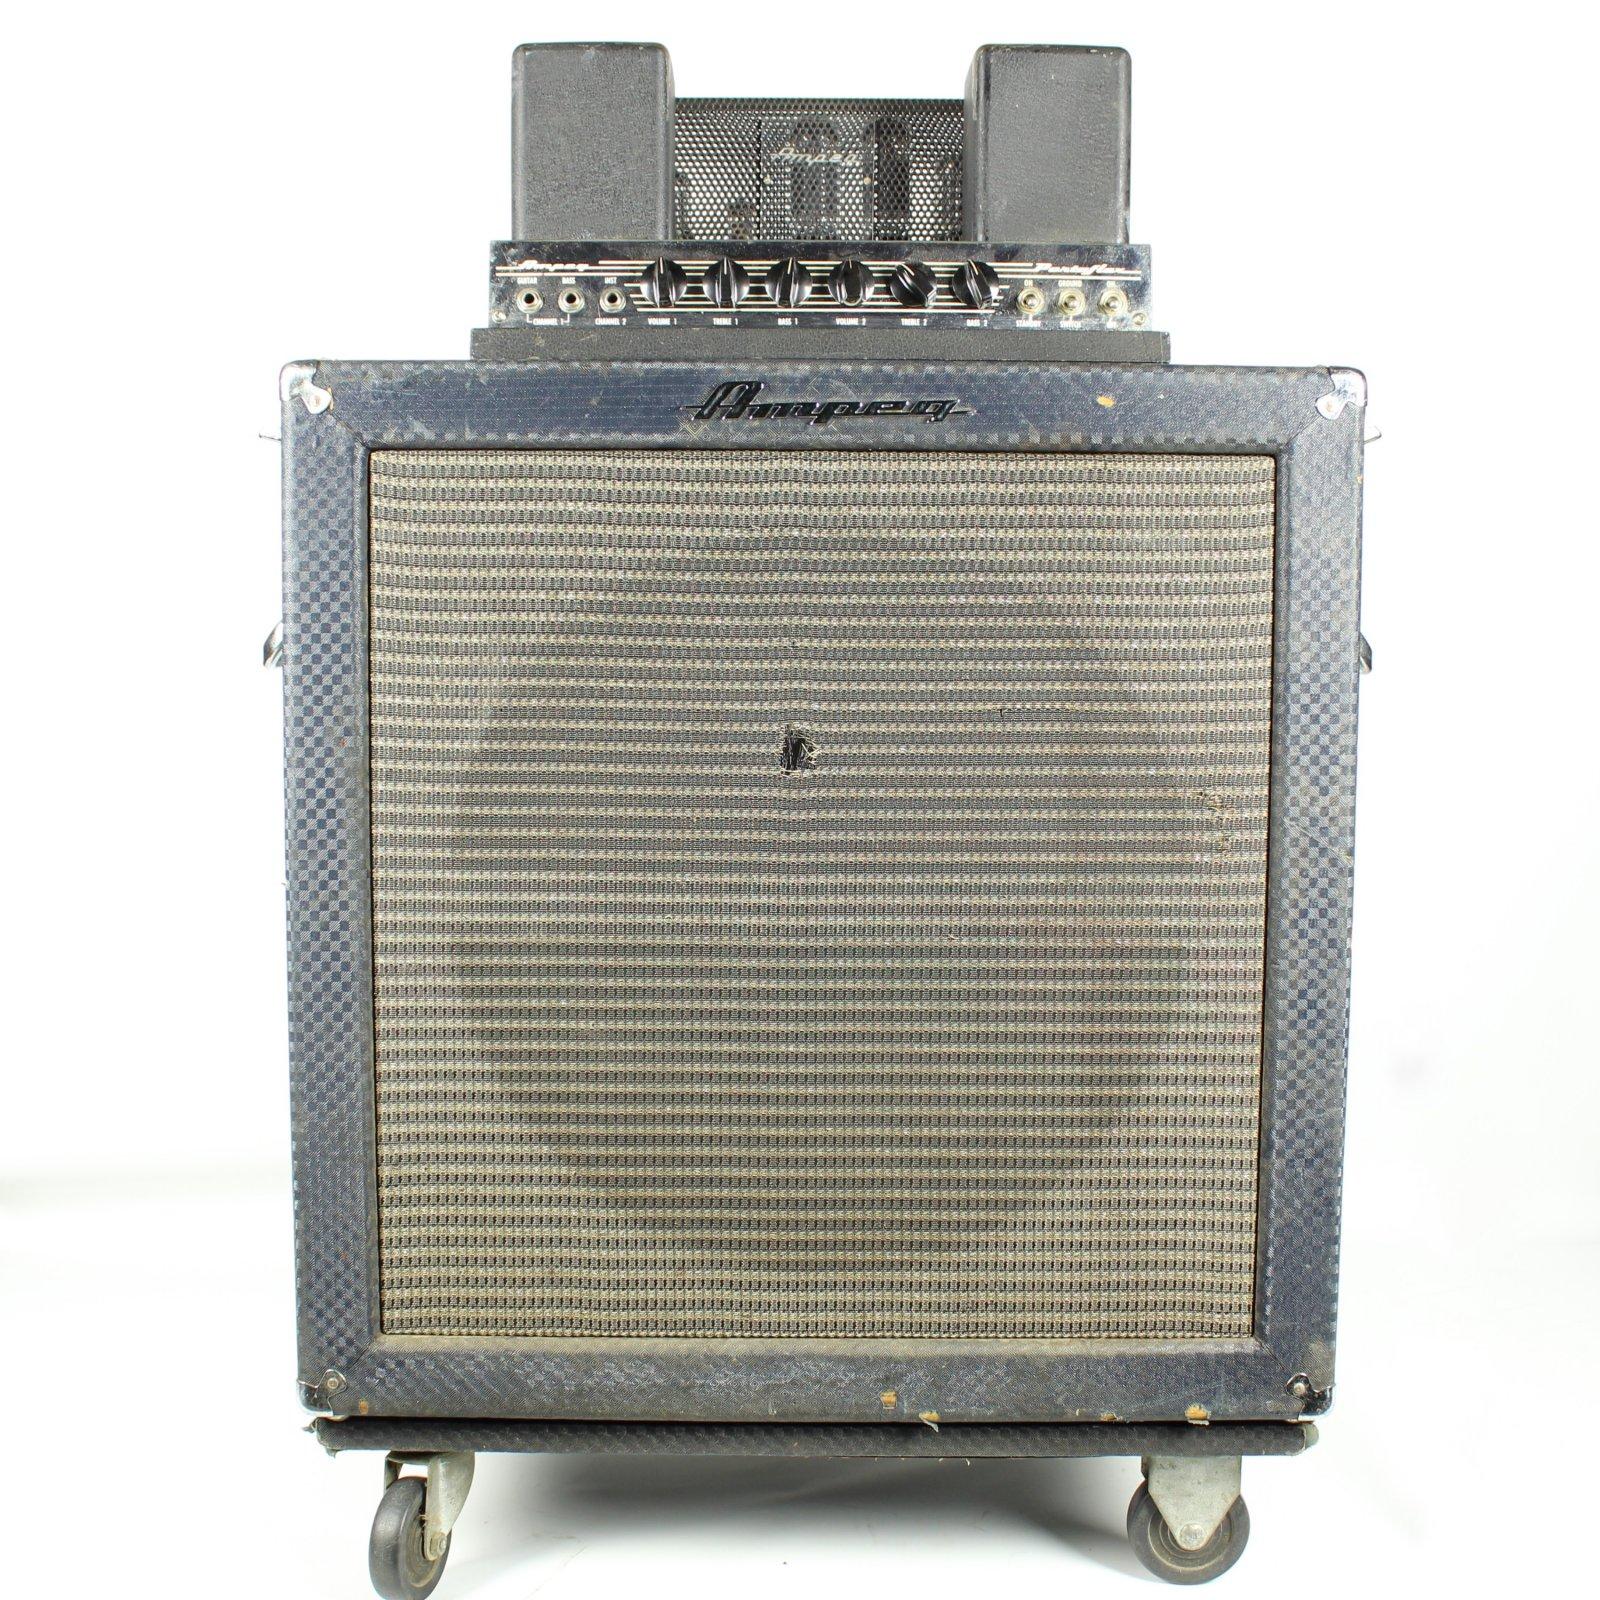 Vintage 1965 Ampeg B-18-N Portaflex Fliptop Bass Amplifier, SN: 039031 (USED)